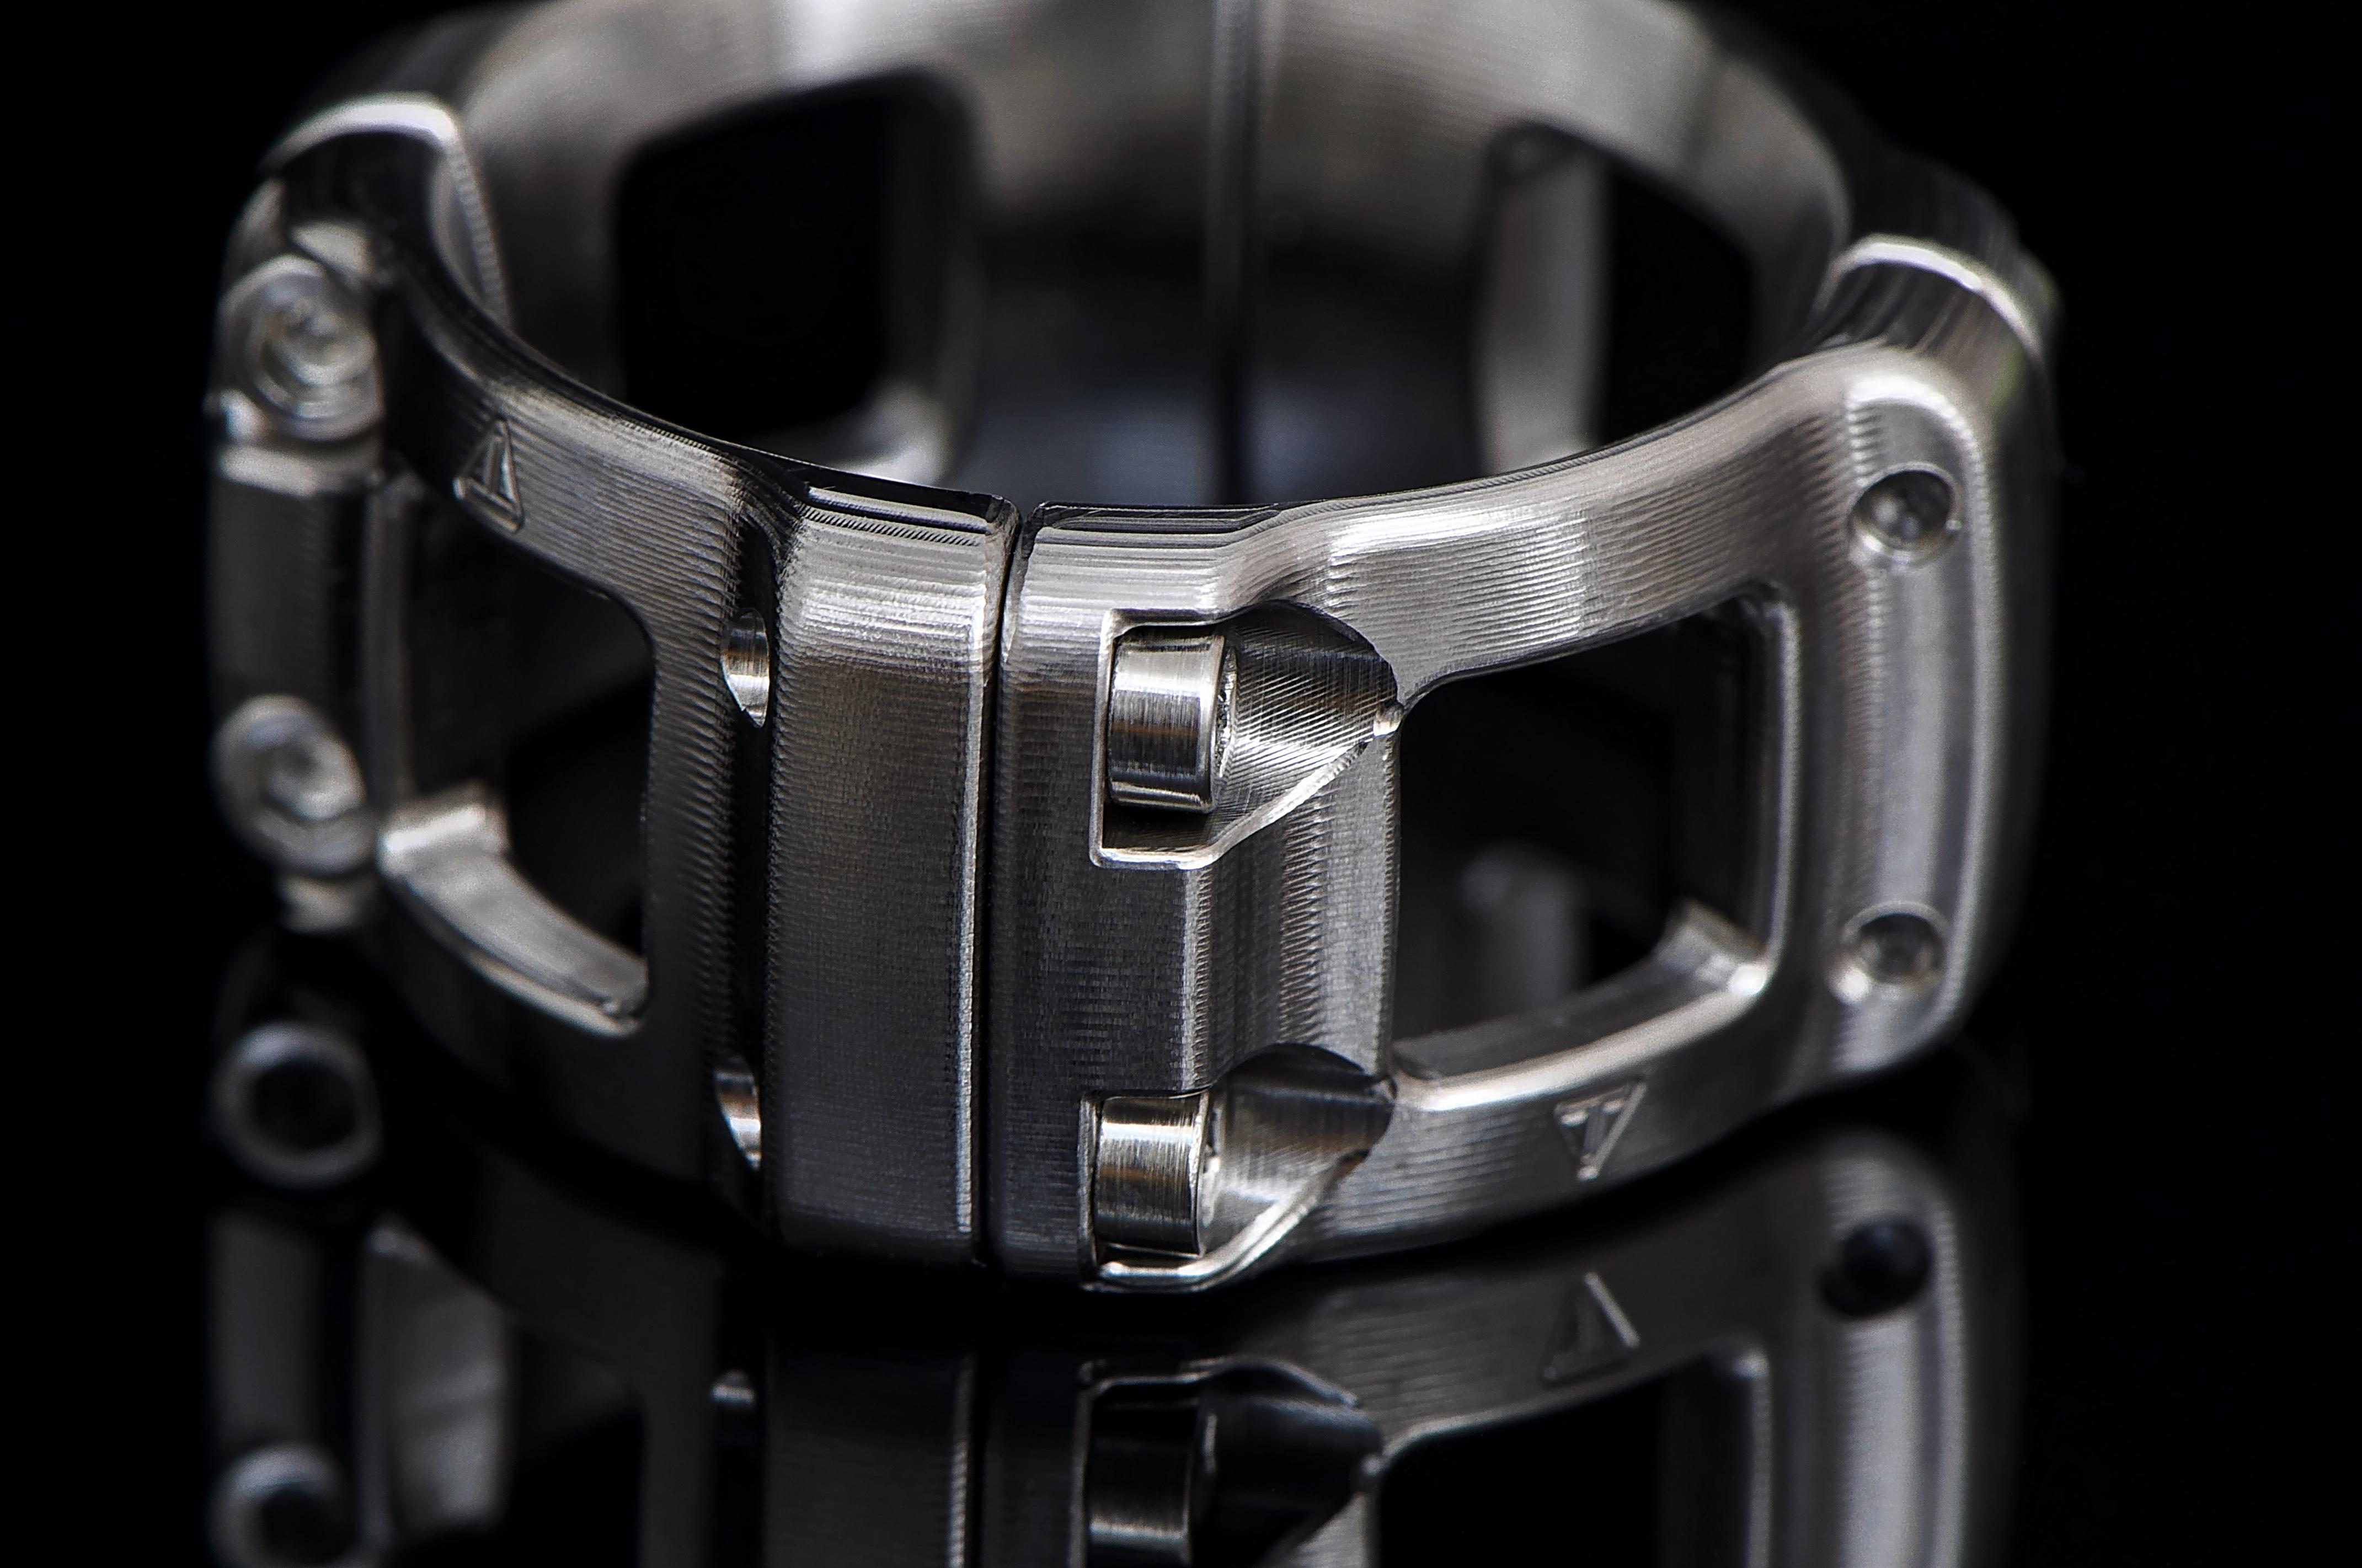 titan ring designs sector ring